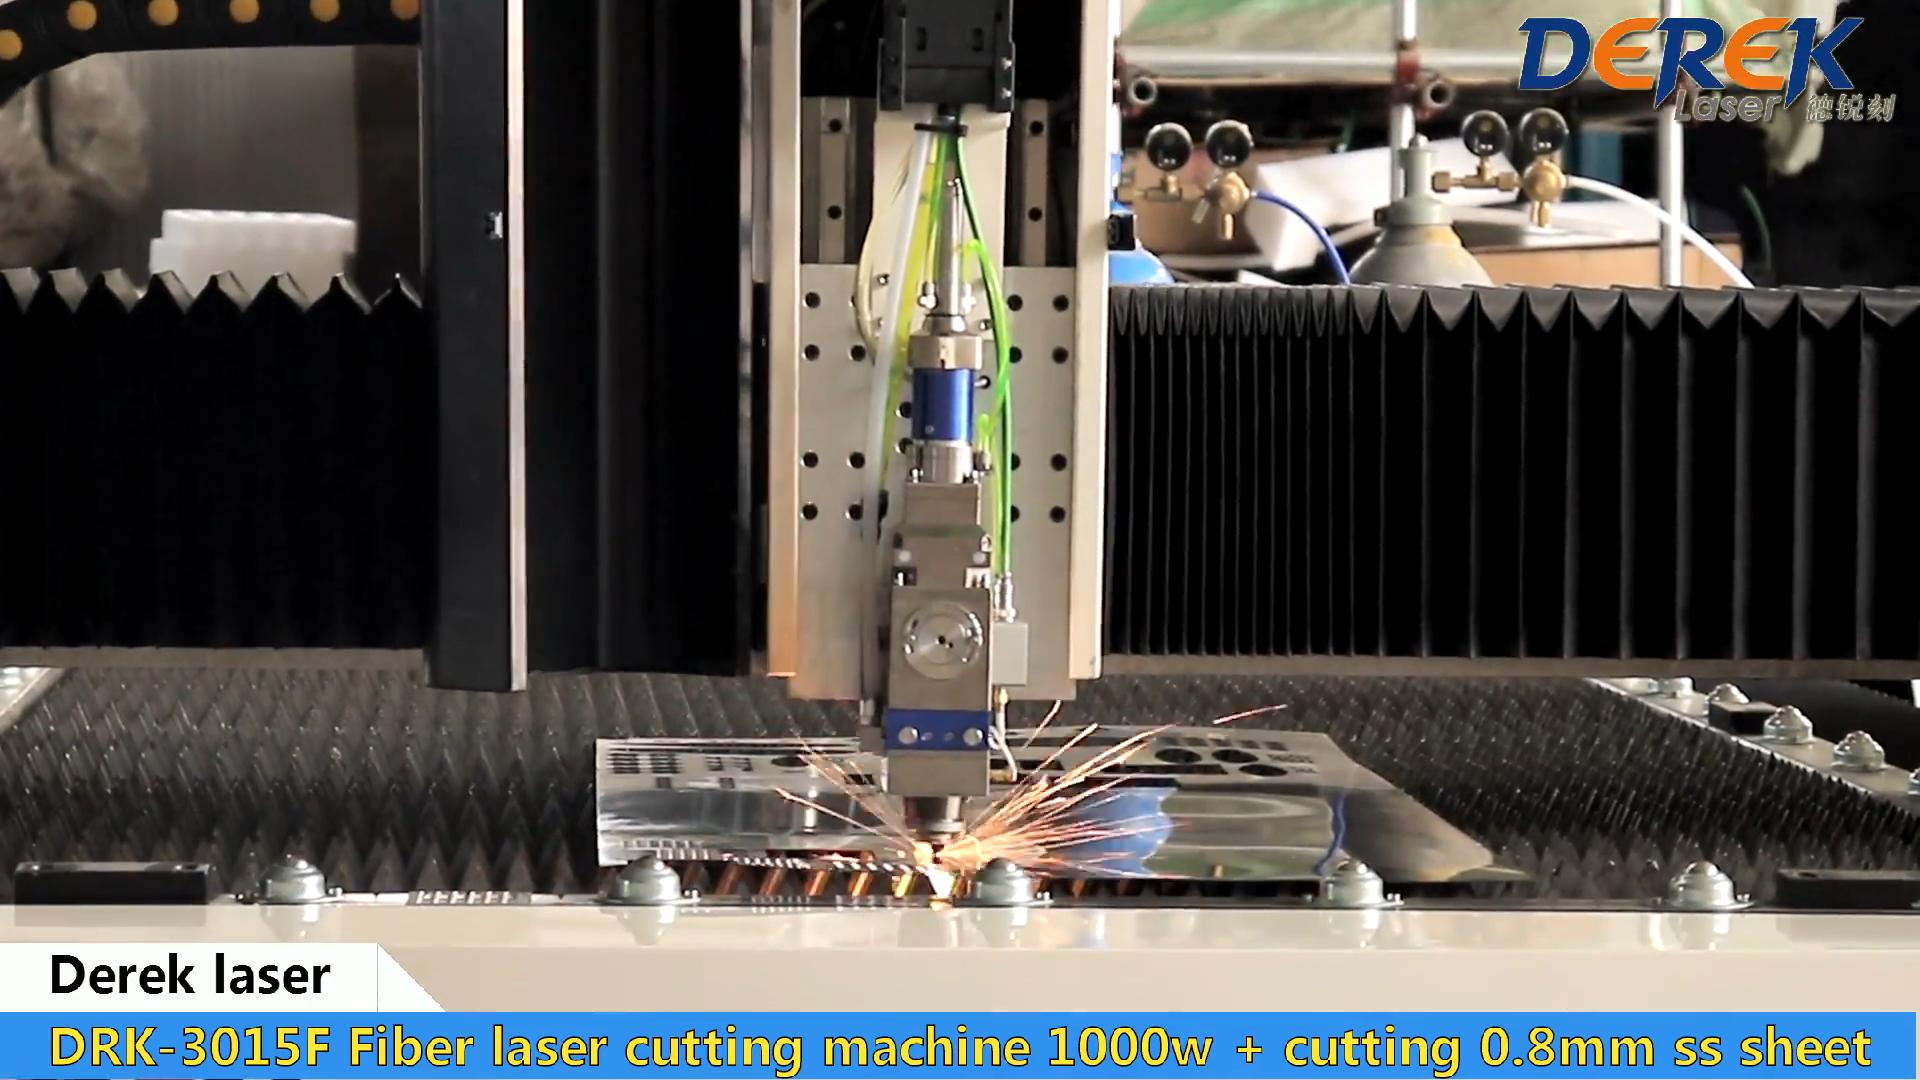 3015 1530 1500W 1000W 2kw 1kw 2000W 750W Cncเลเซอร์ตัดเครื่องท่อโลหะss Cs Carbonสแตนเลสเหล็กแผ่นราคา